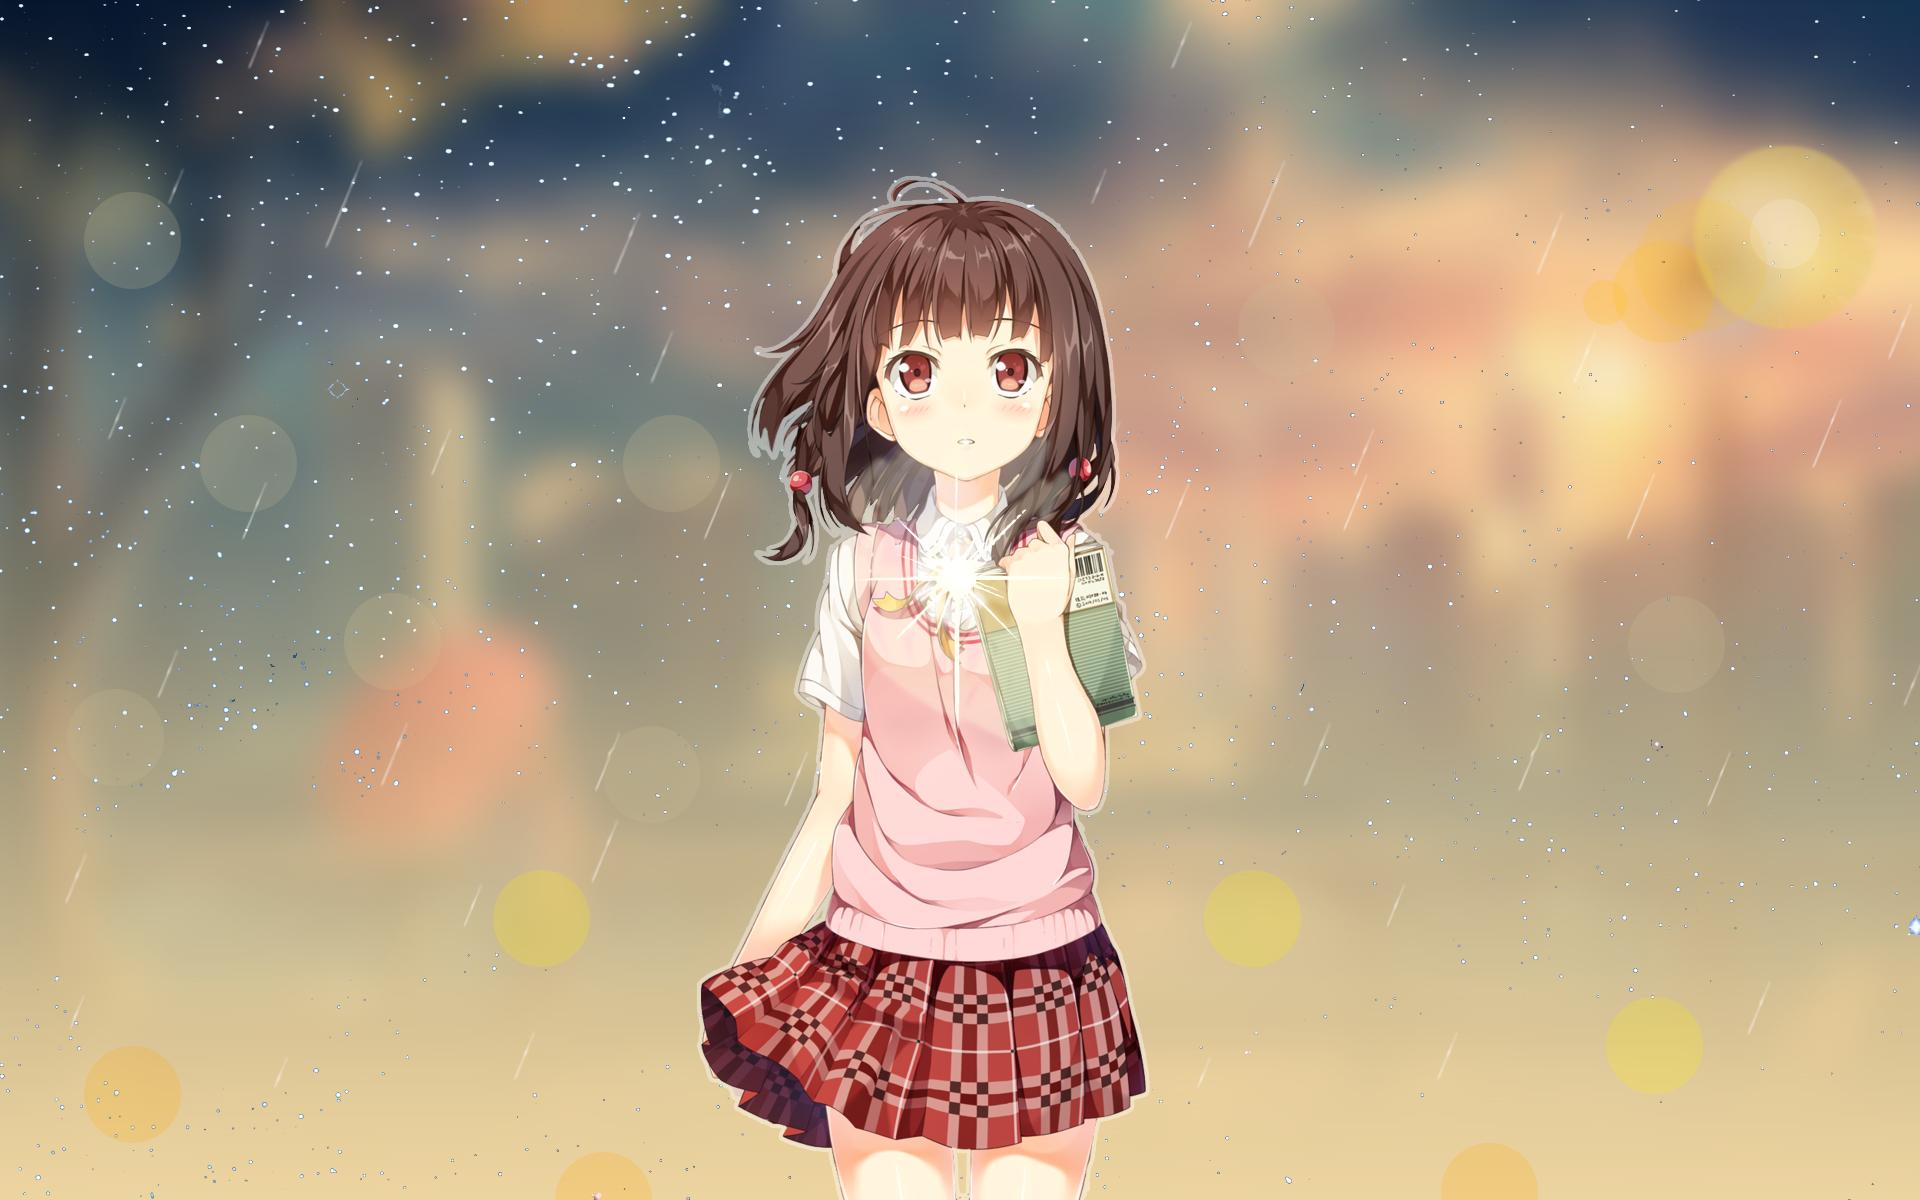 Anime 1920x1200 anime anime girls anime sky anime vectors cartoon Japan fan art Photoshop brunette miniskirt loli